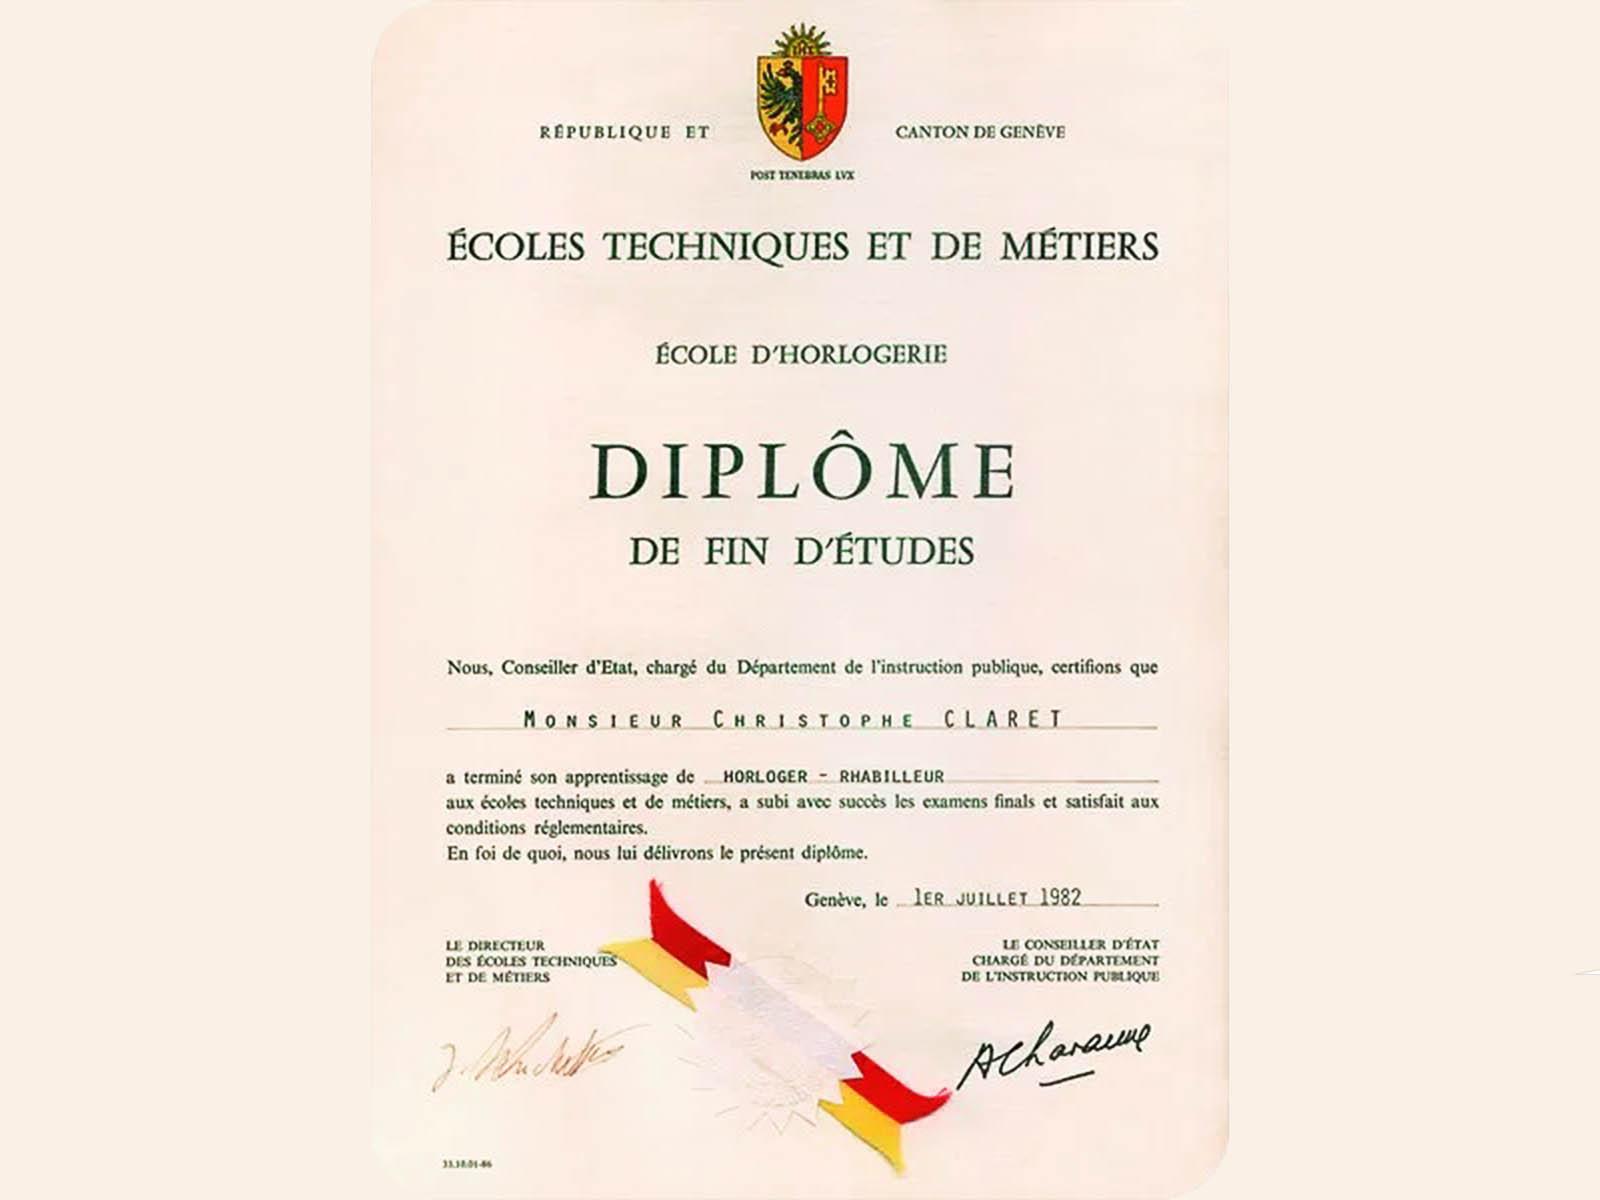 christophe-claret-diploma-certificate.jpg